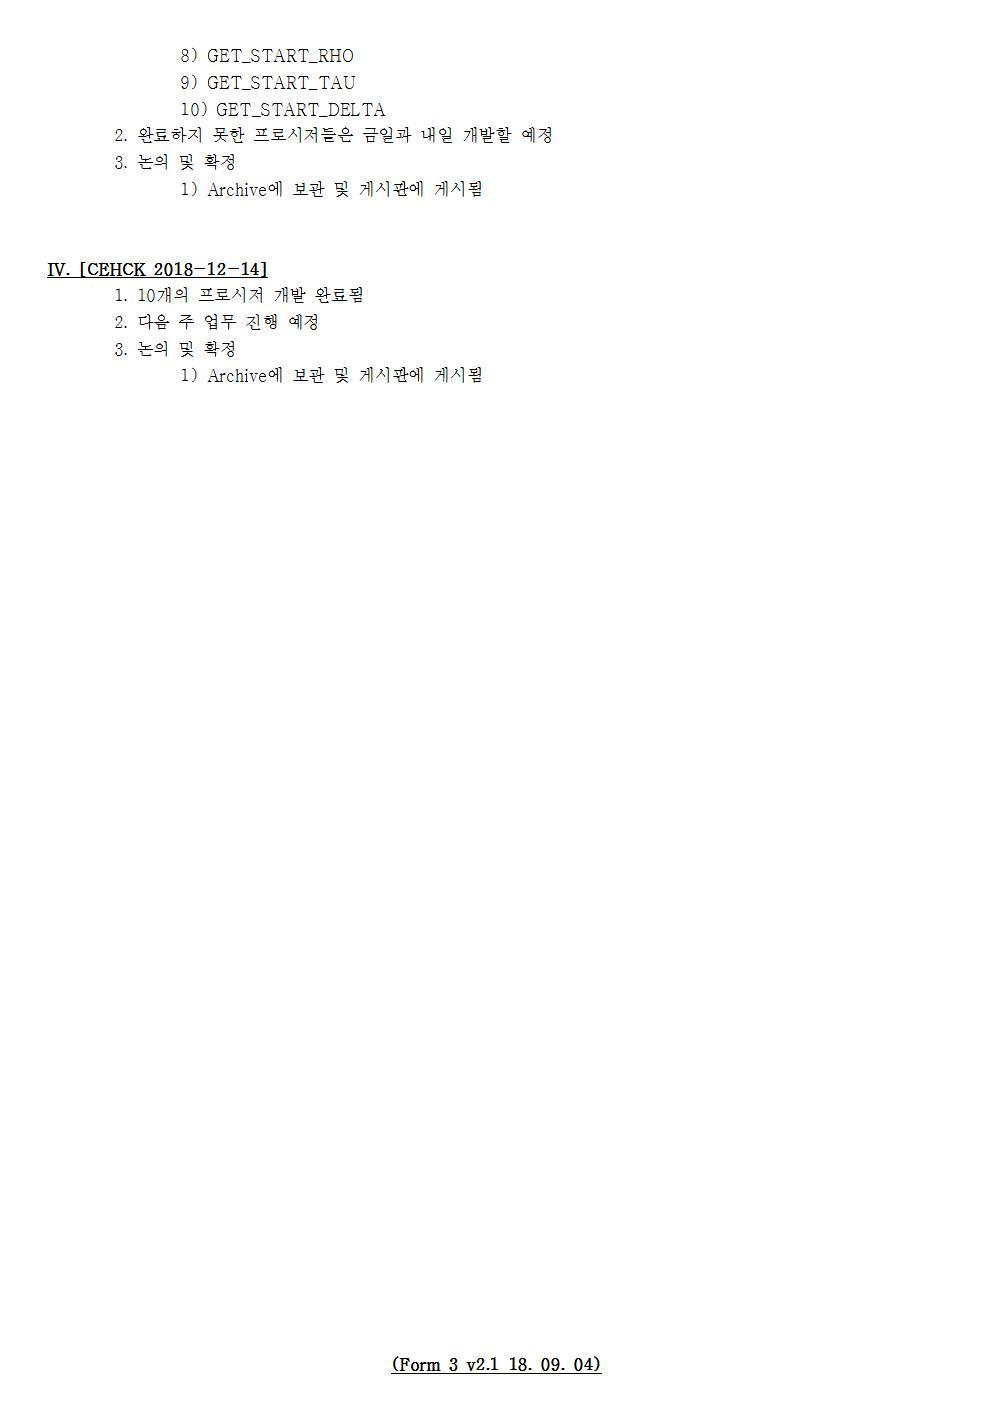 D-[18-001-RD-01]-[SAVE 3.0]-[2018-12-14][SH]002.jpg